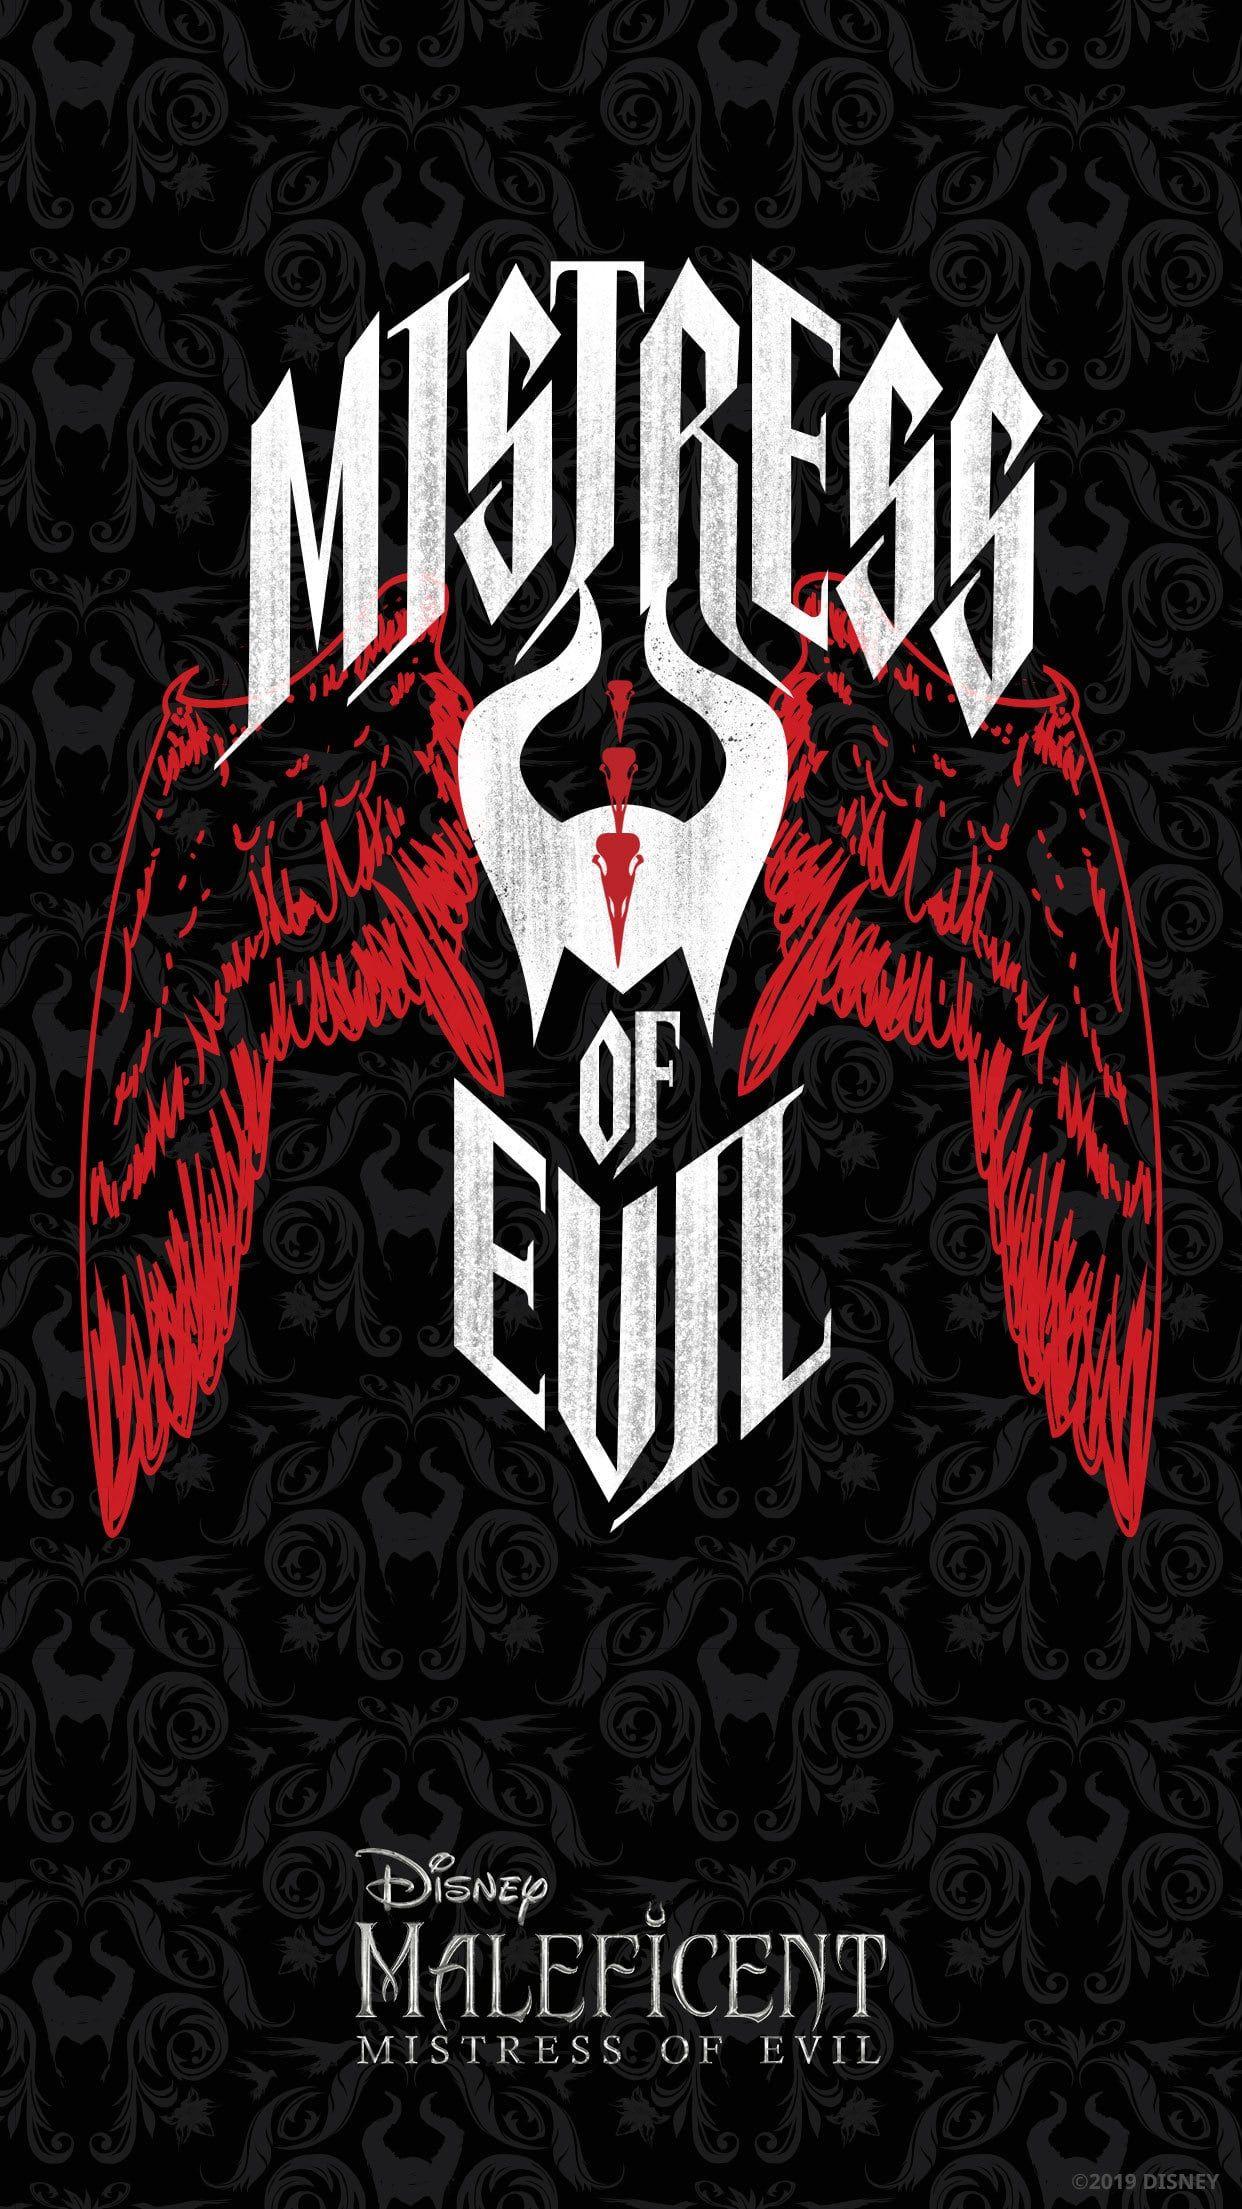 Maleficent Mistress Of Evil In 2020 Maleficent Evil Disney Disney Maleficent